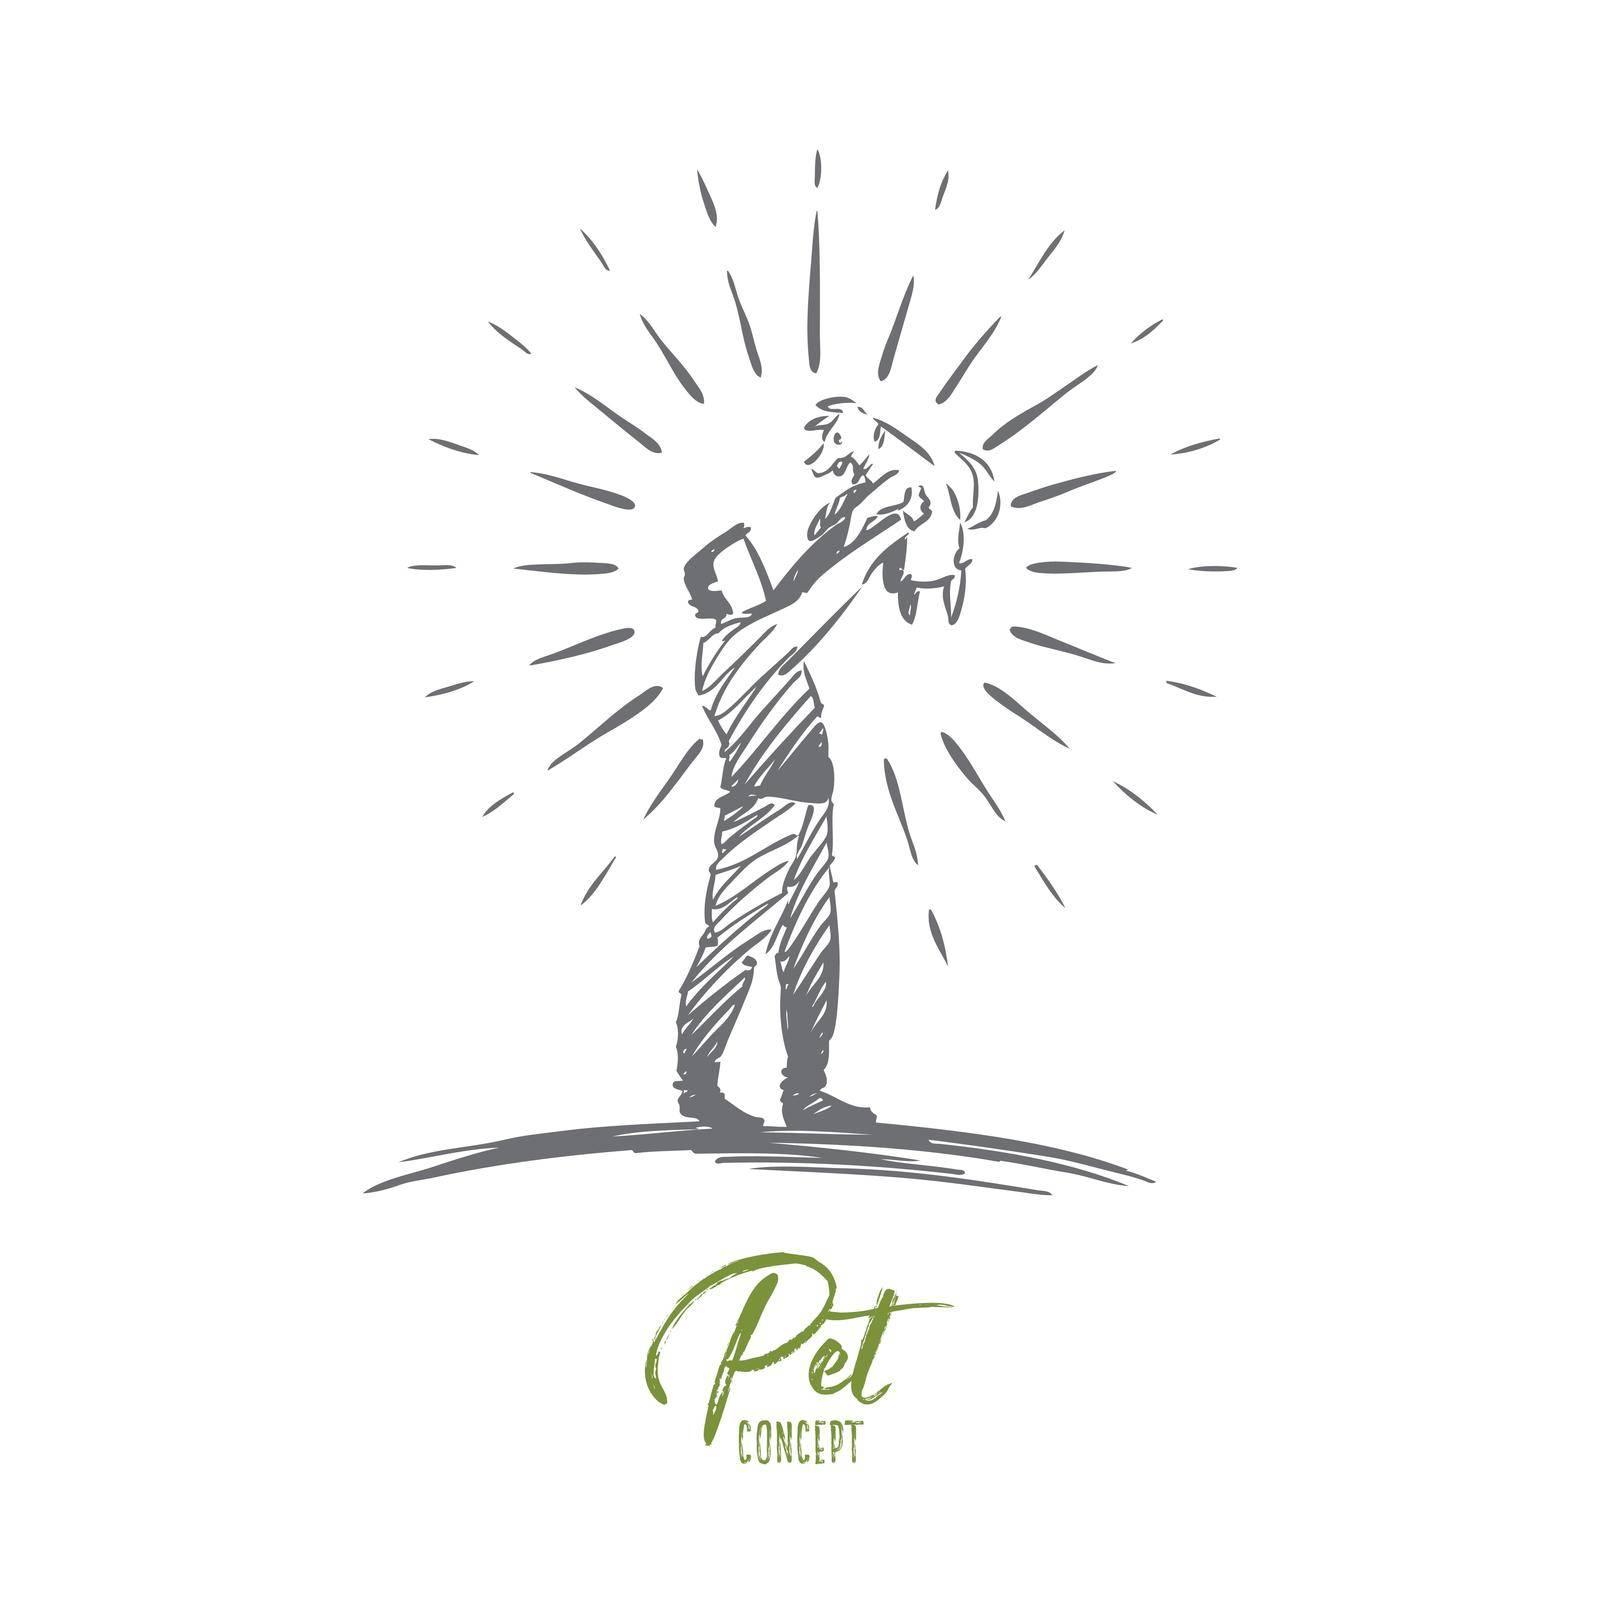 Pet, animal, dog, happy, love concept. Hand drawn isolated vector. by Vasilyeva